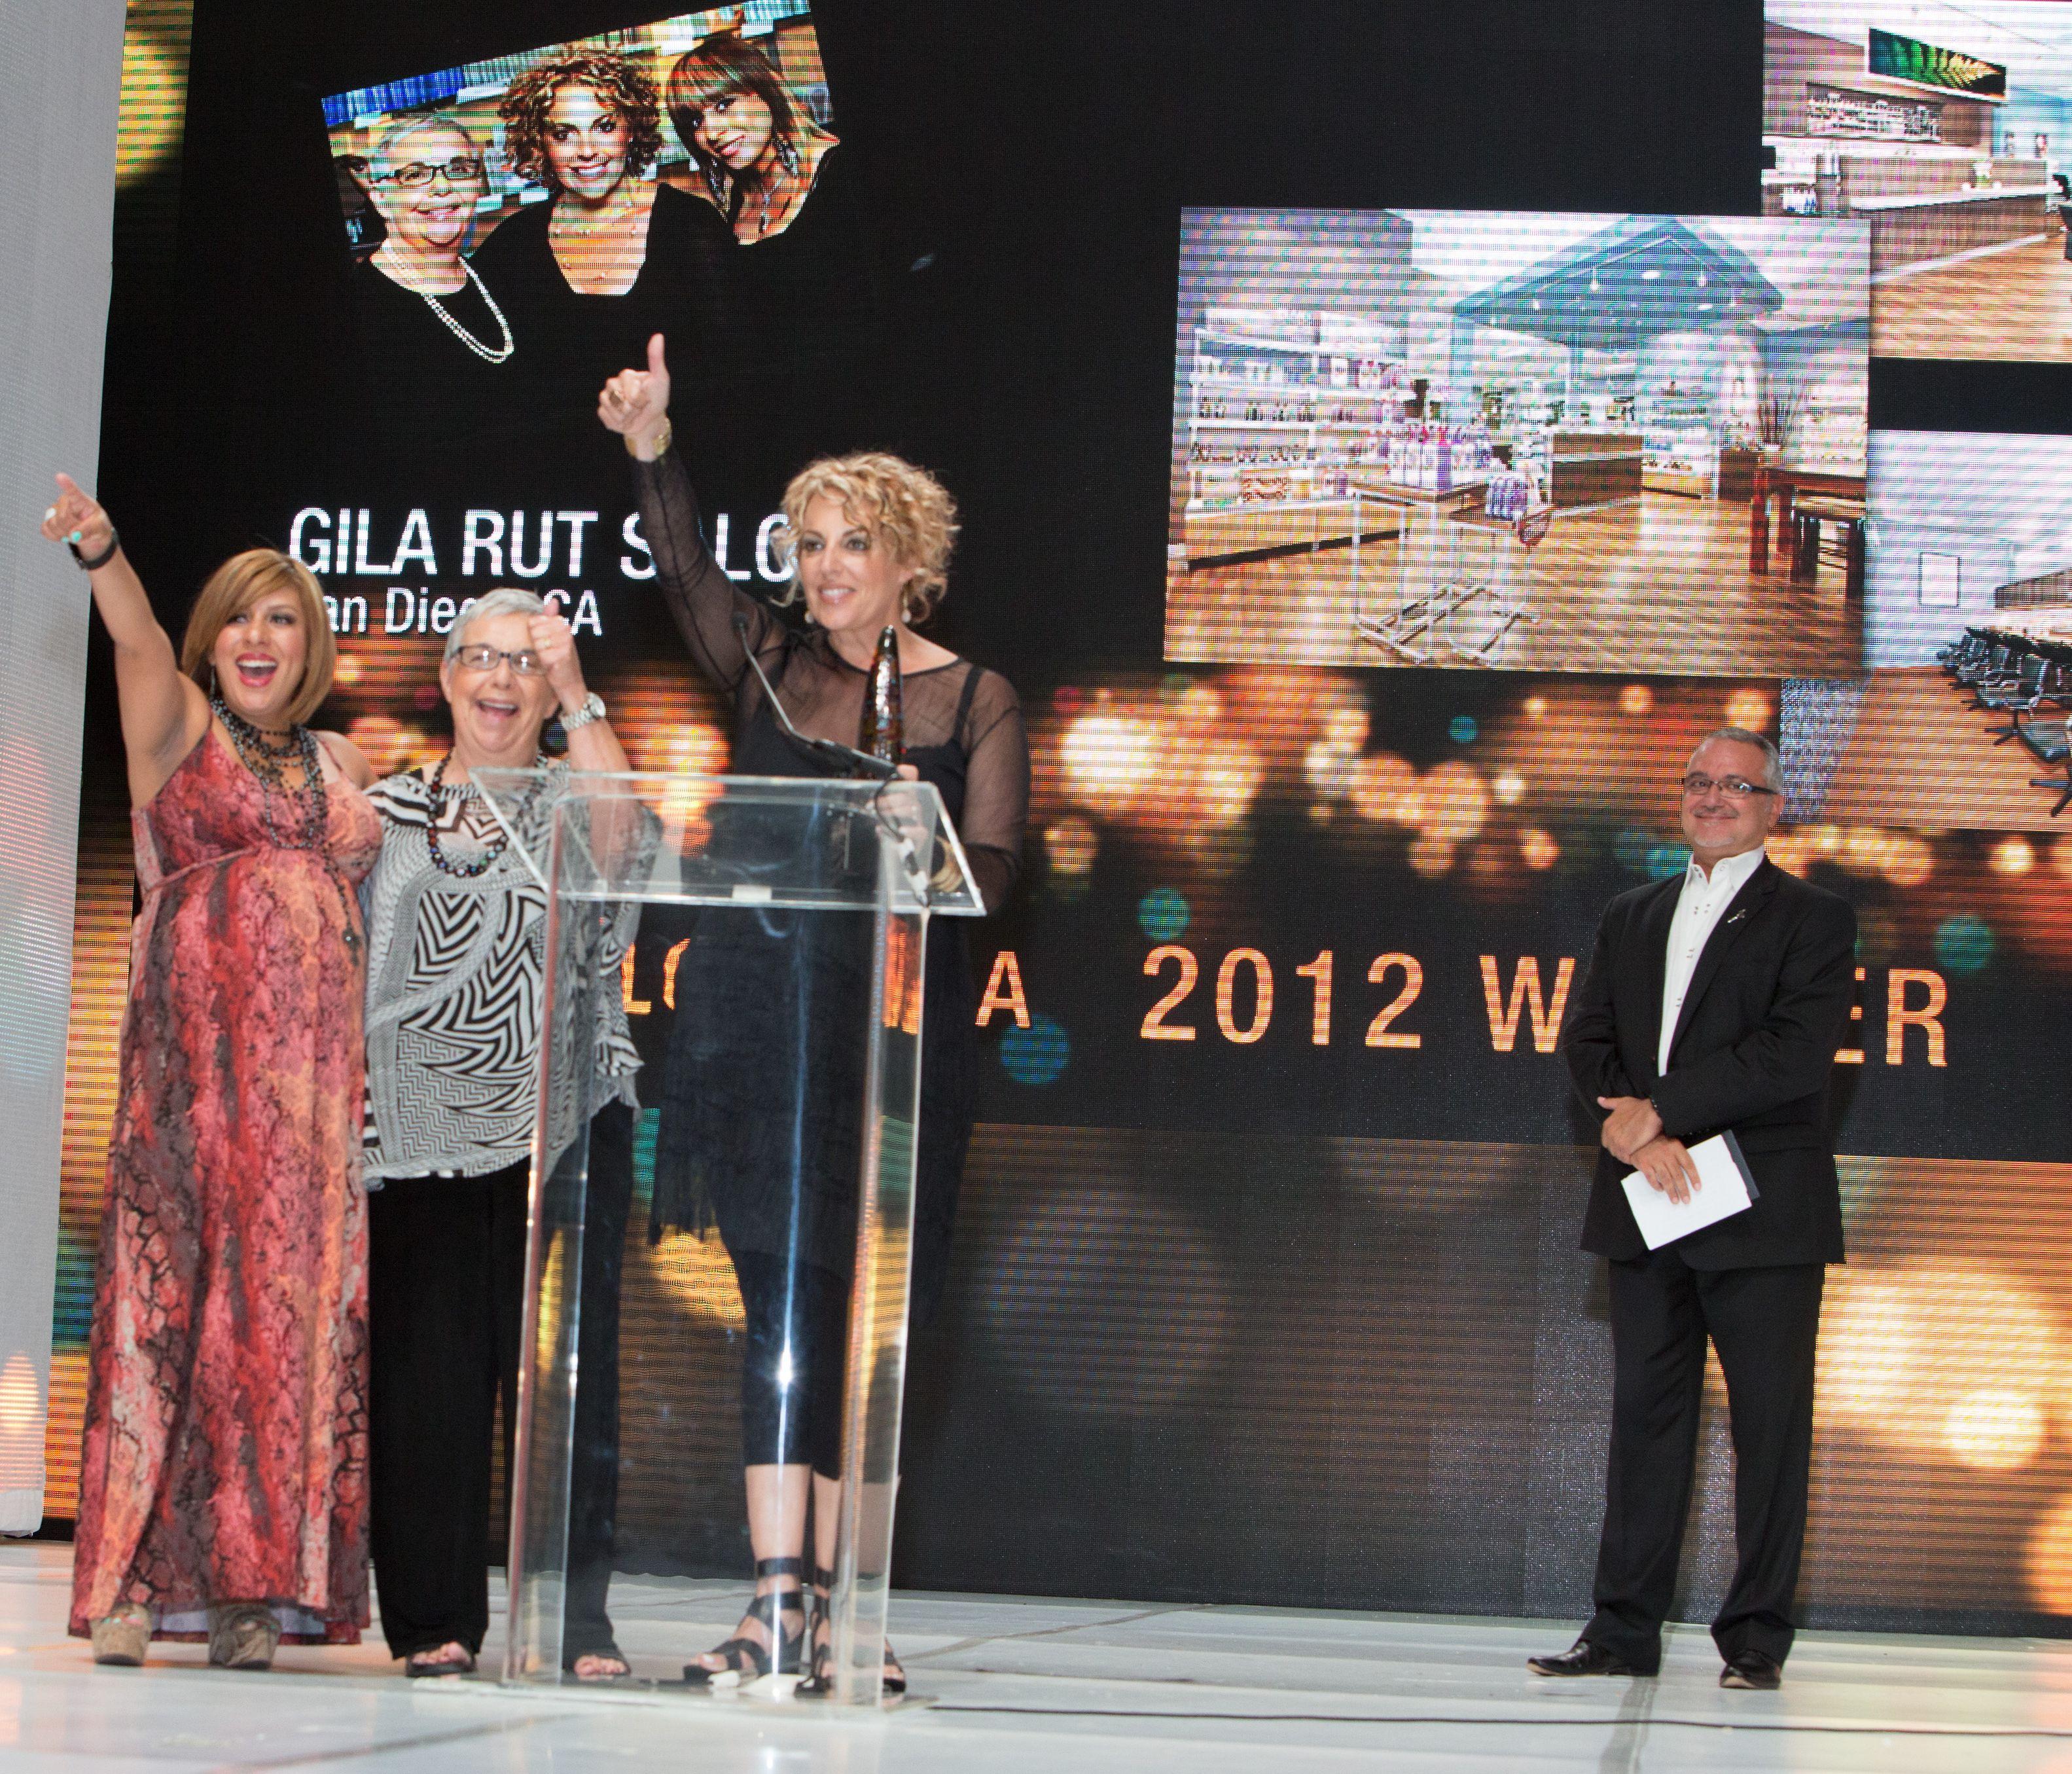 Gila rut aveda salons wins top mba 39 business award for Salon mba